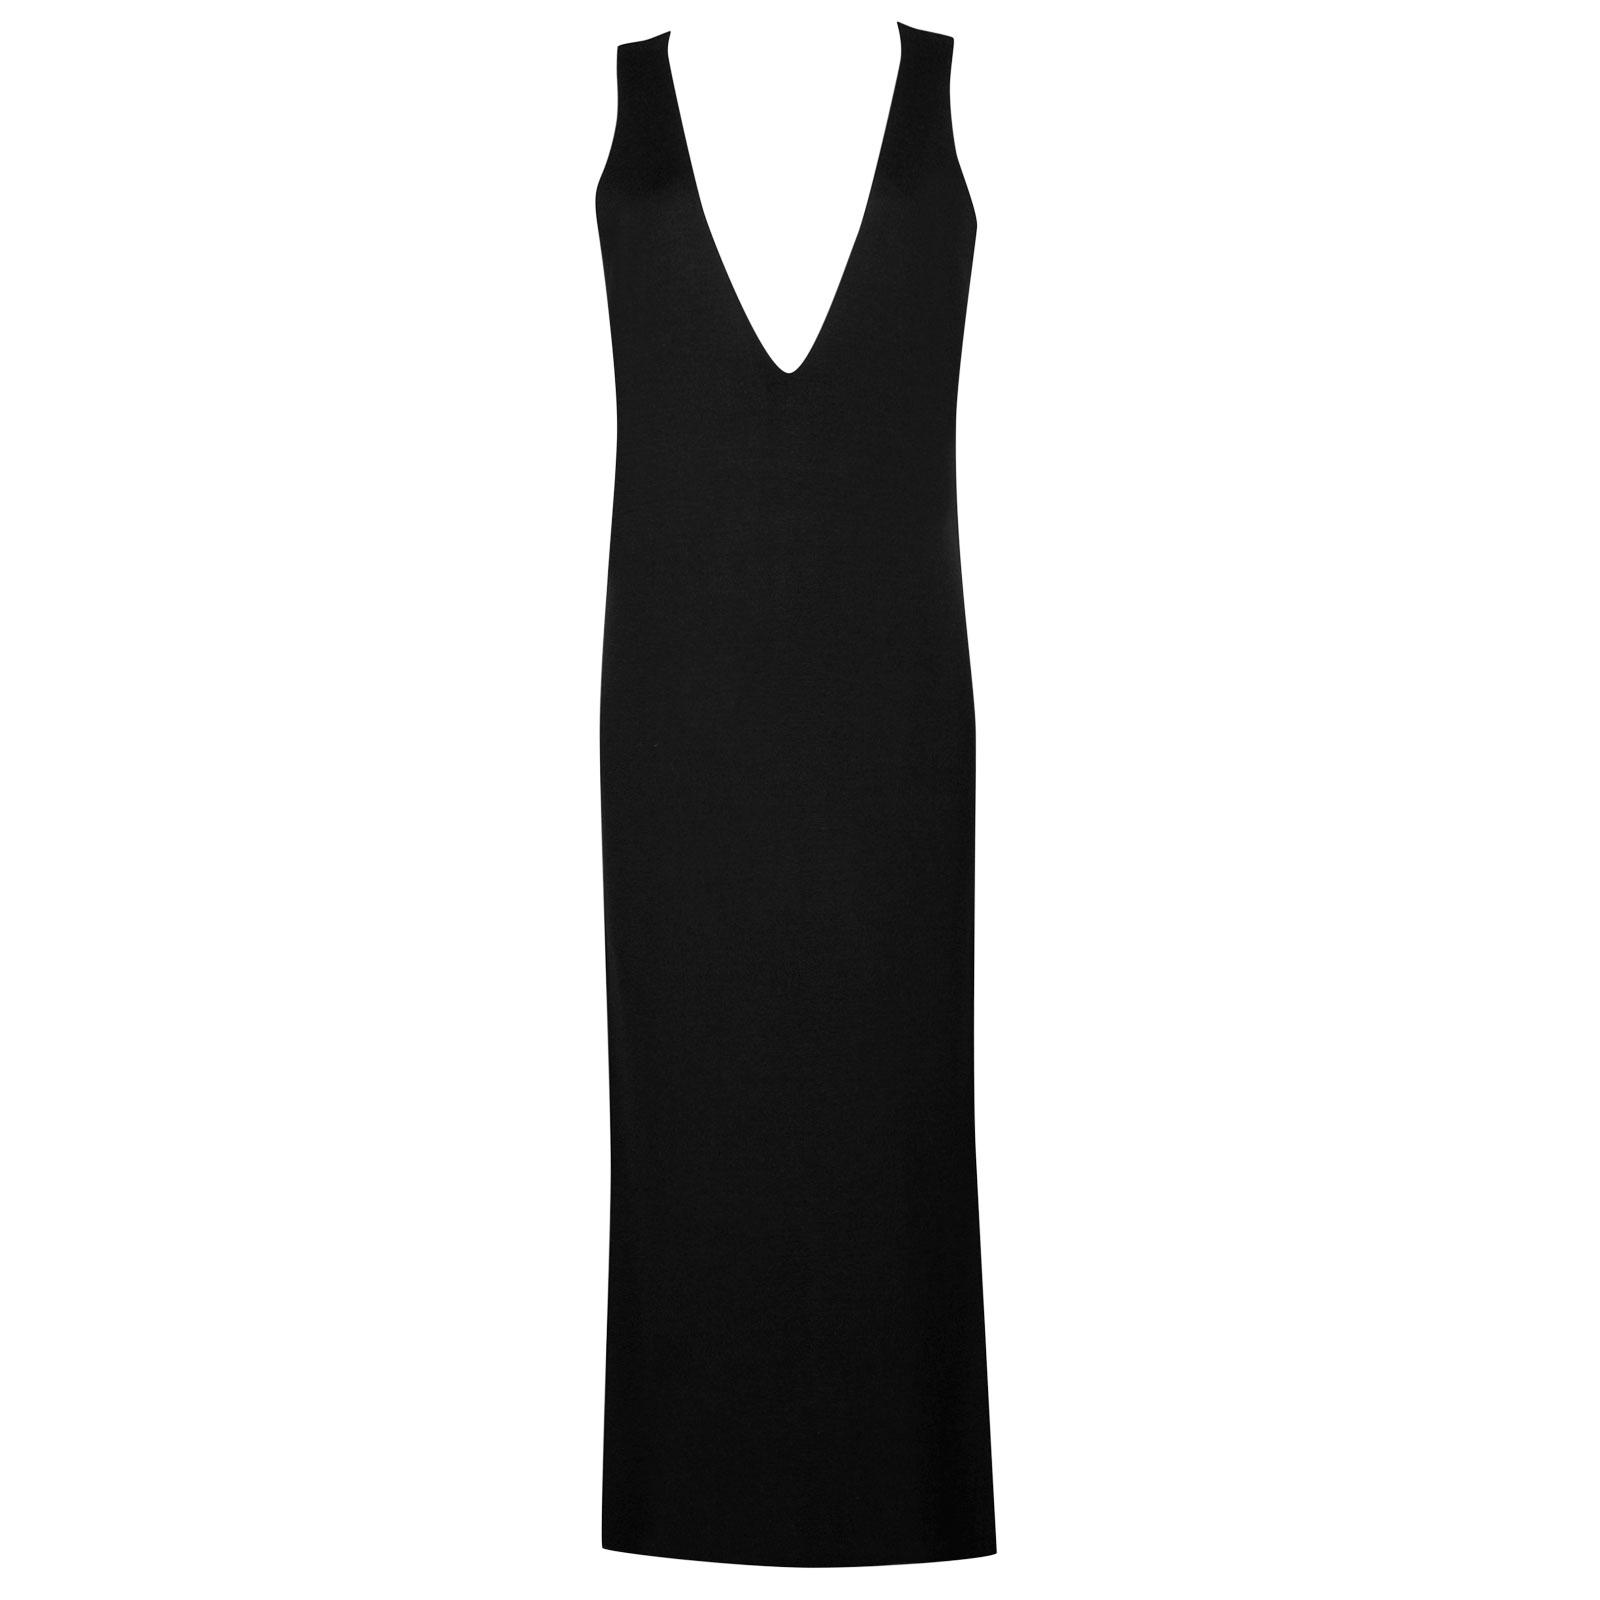 John Smedley odell Merino Wool Dress in Black-M